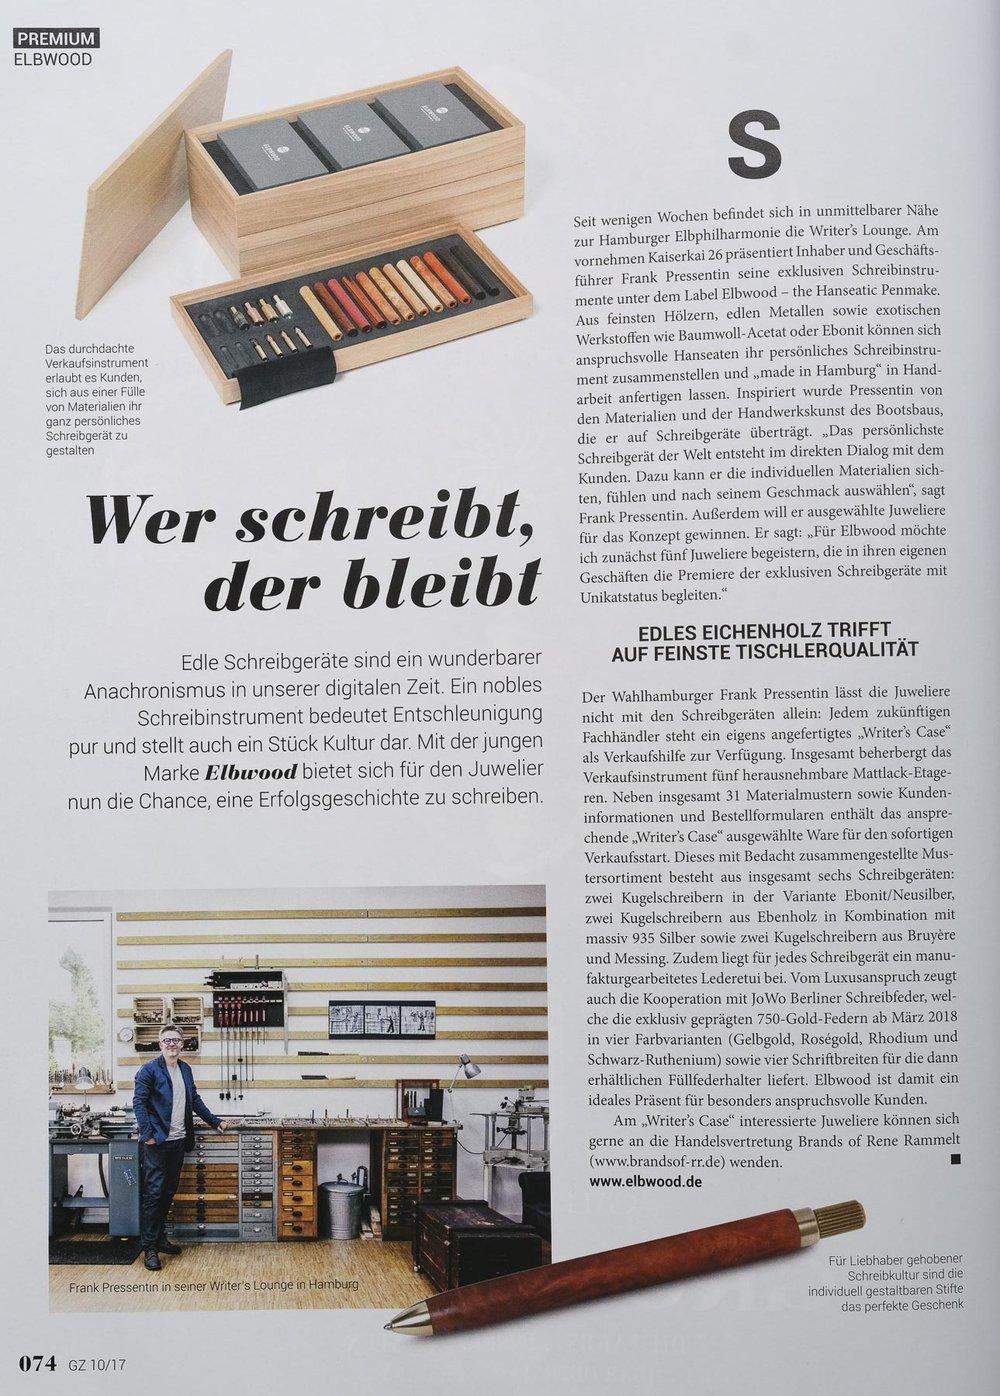 ELBWOOD_Zeitungsartikel-4.jpg